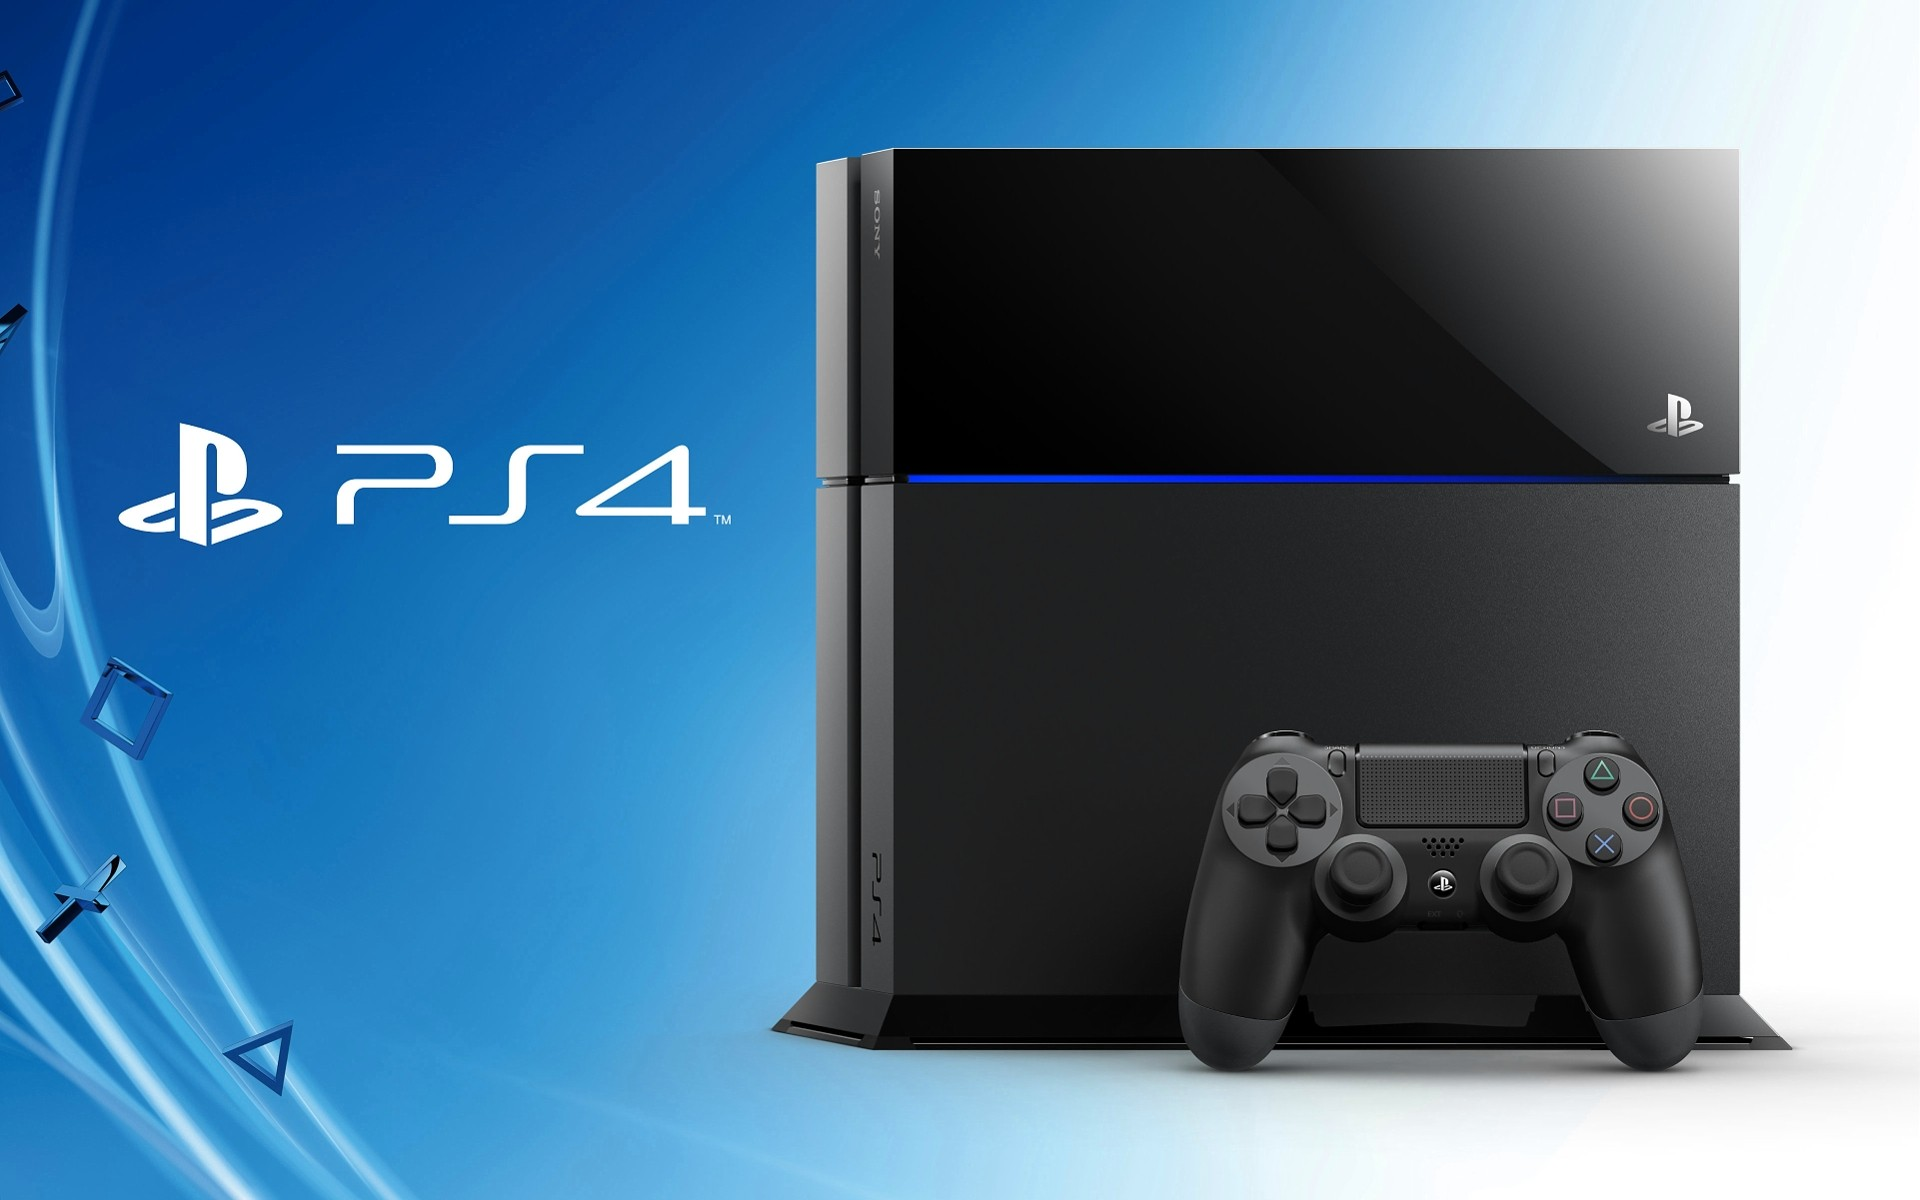 sony-playstation-4-hd-image  Sony Playstation 4